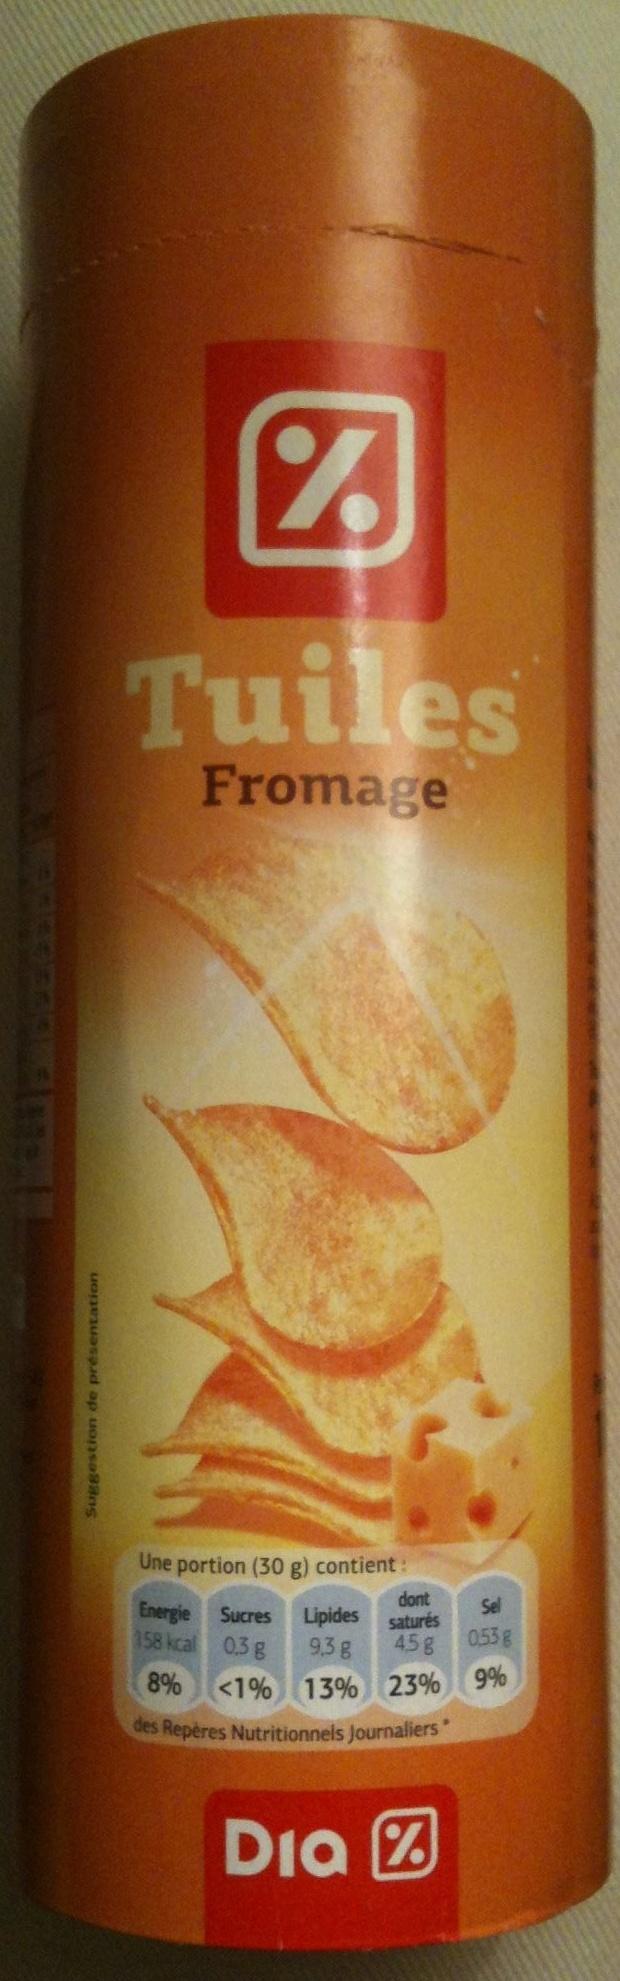 Tuiles Fromage - Produit - fr